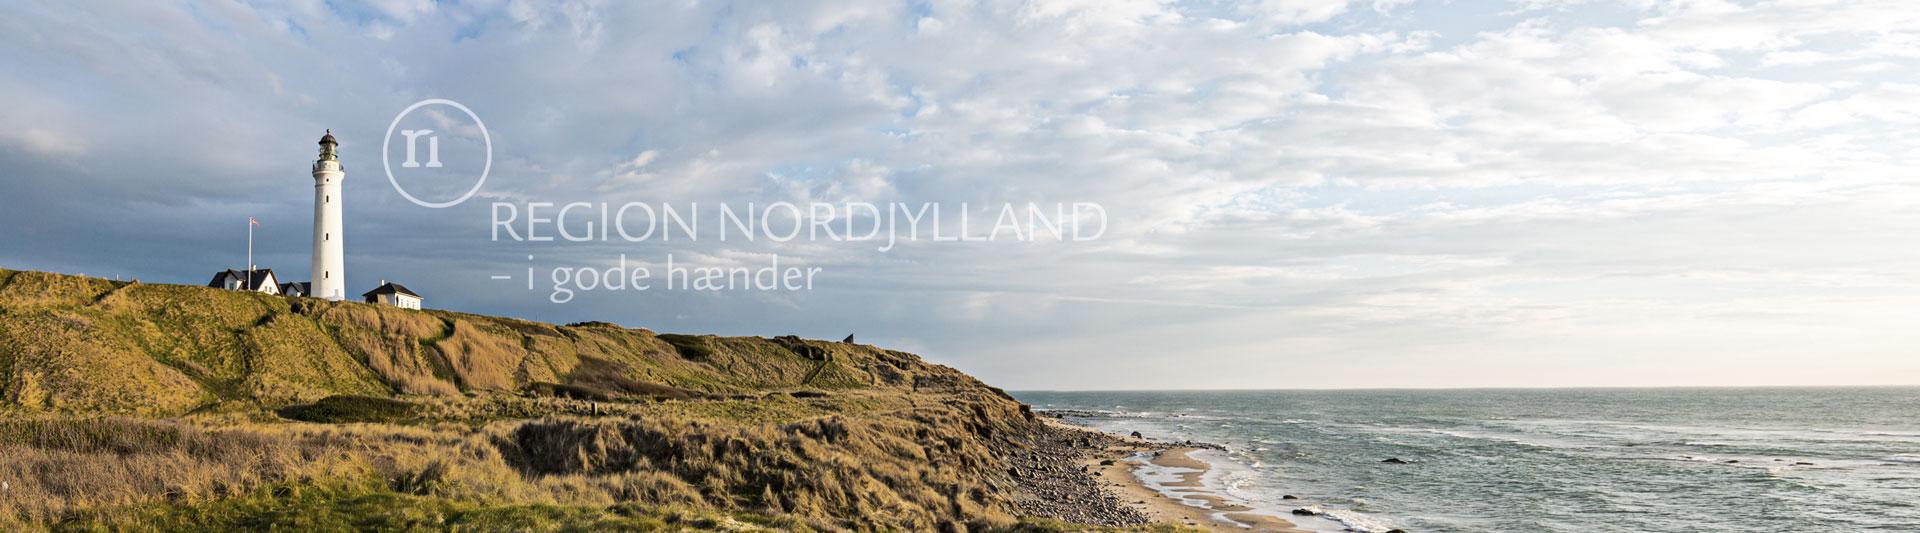 Nordjylland - Topbanner_billeder_Nordjylland3